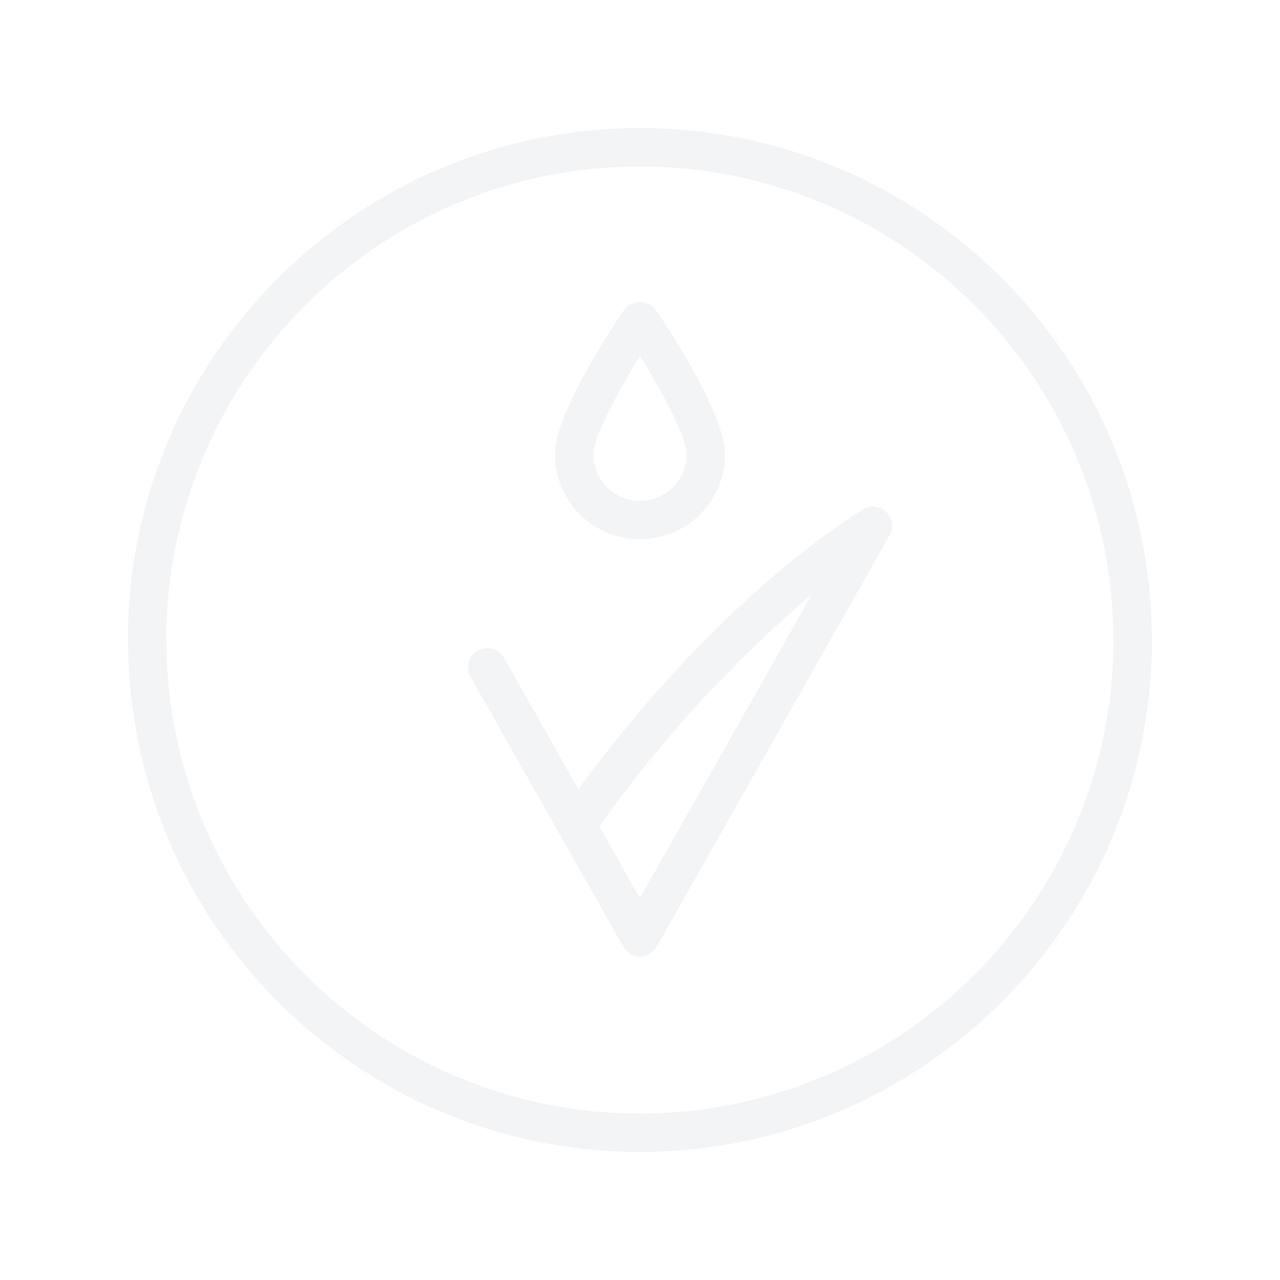 TAHE Bio-Fluid 2-Phase Blonde Conditioner 300ml